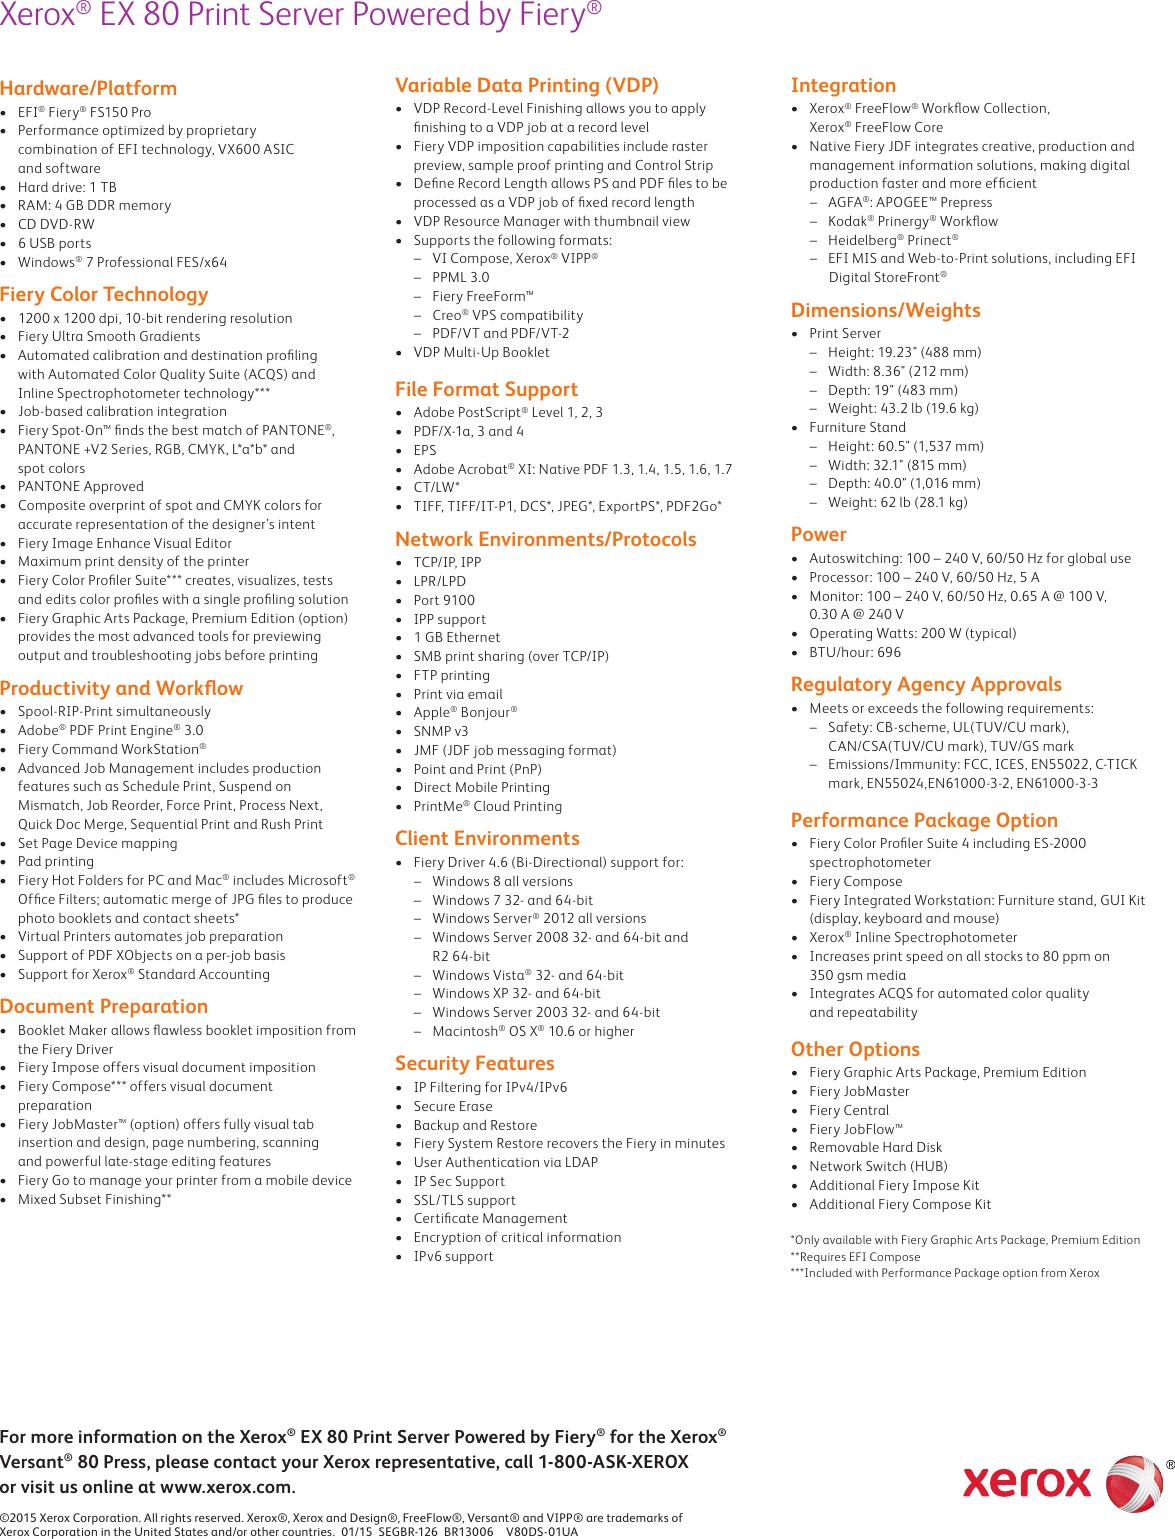 Xerox Versant 80 Press Specifications